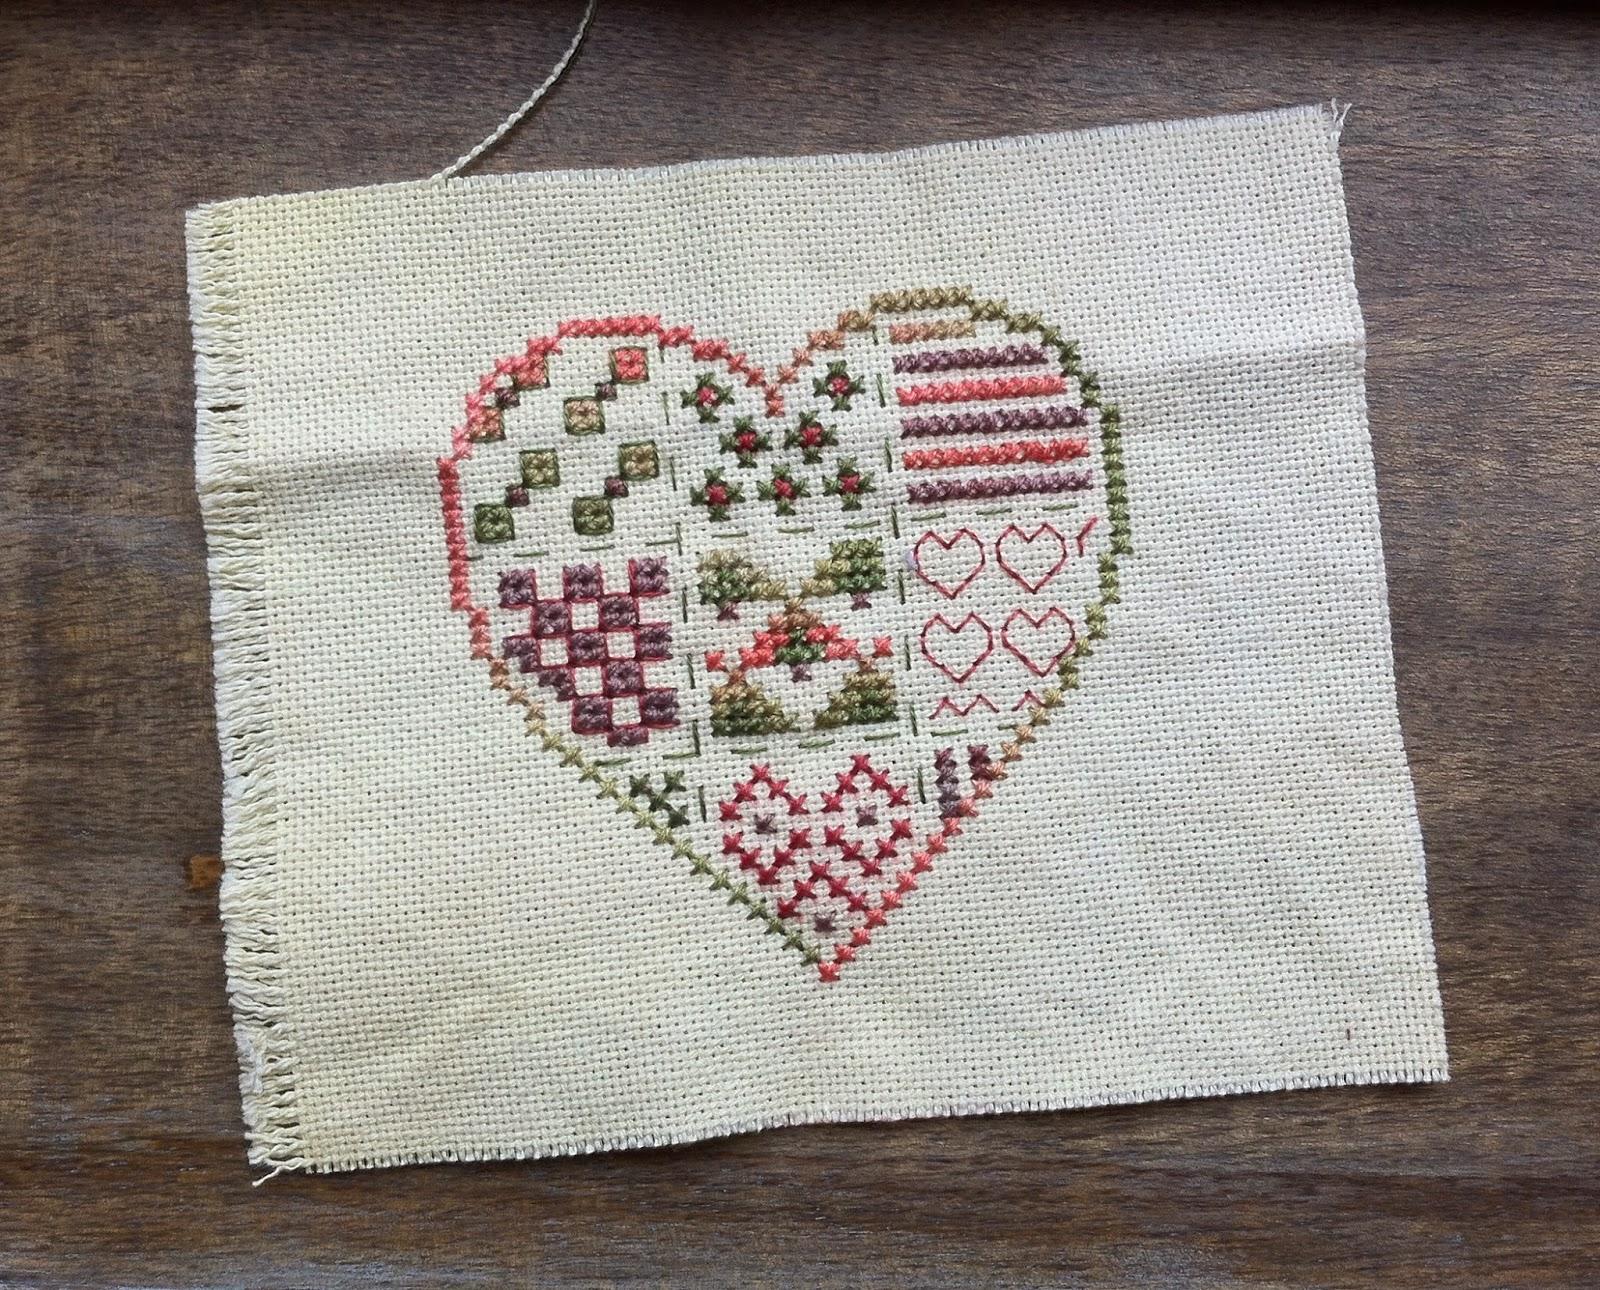 Cross stitch mania